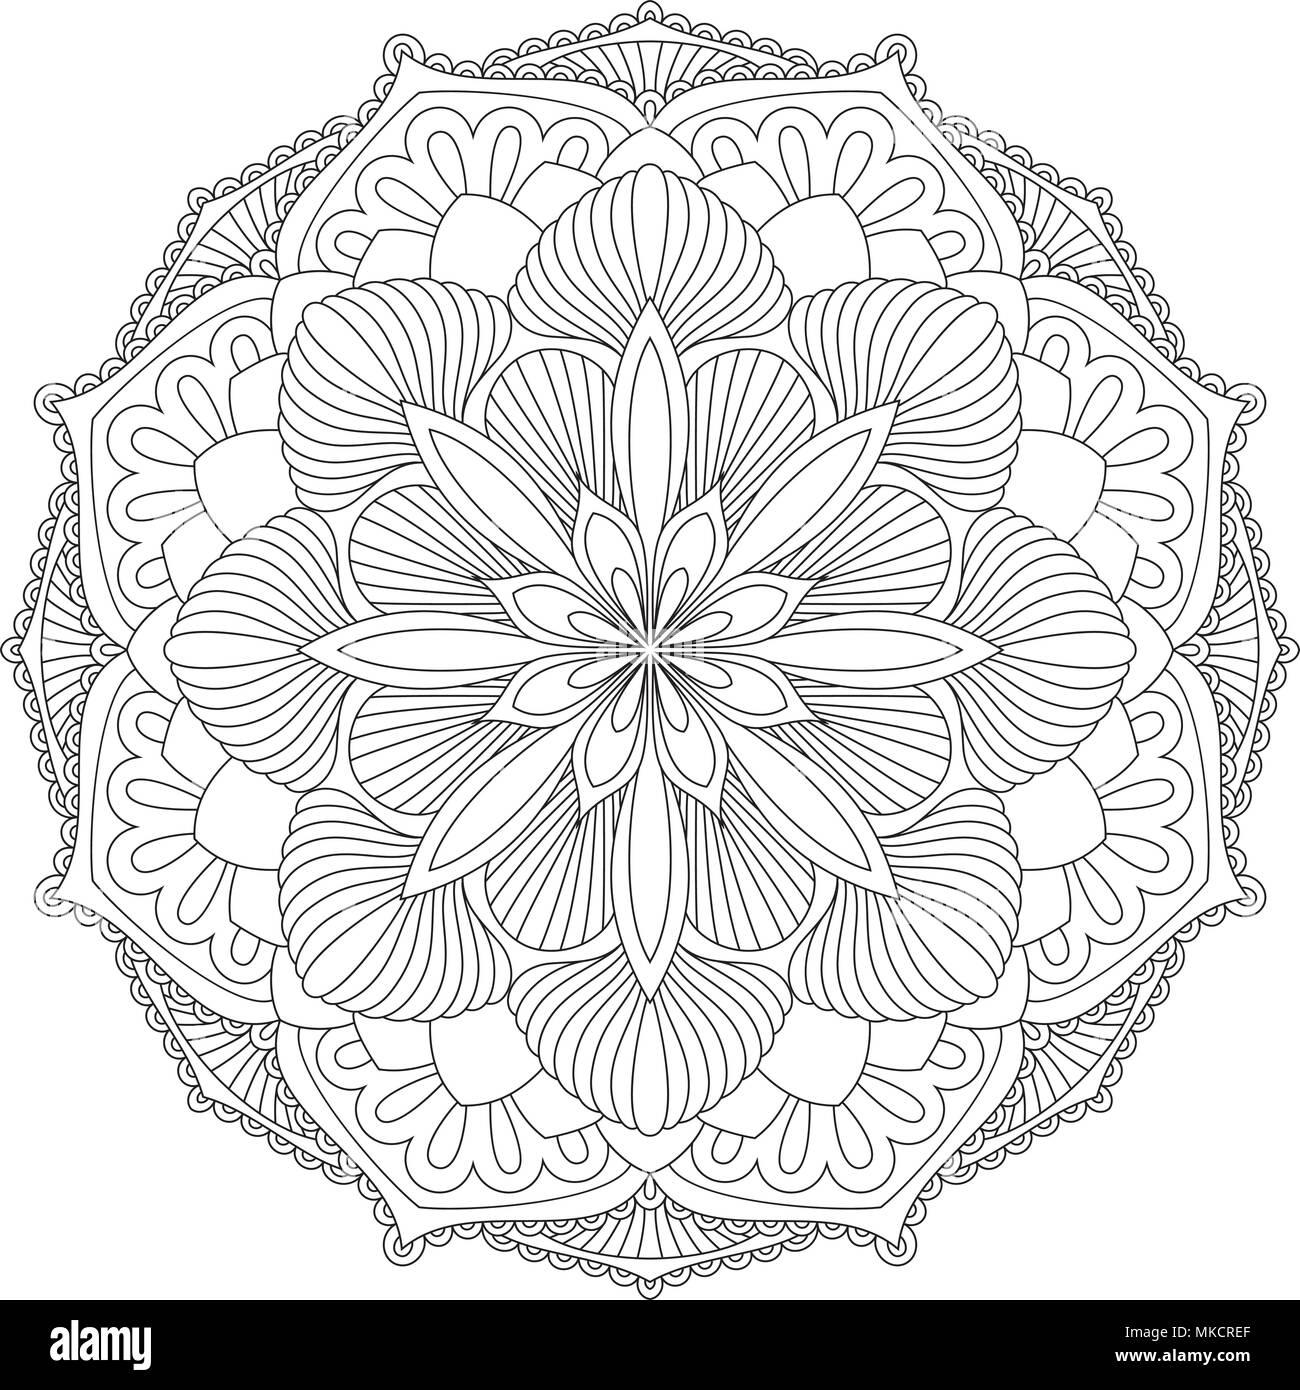 Vector Mandala. Oriental decorative element. Islam, Arabic, Indian, turkish, pakistan, chinese, ottoman motifs. Ethnic design elements. Hand drawn man - Stock Image